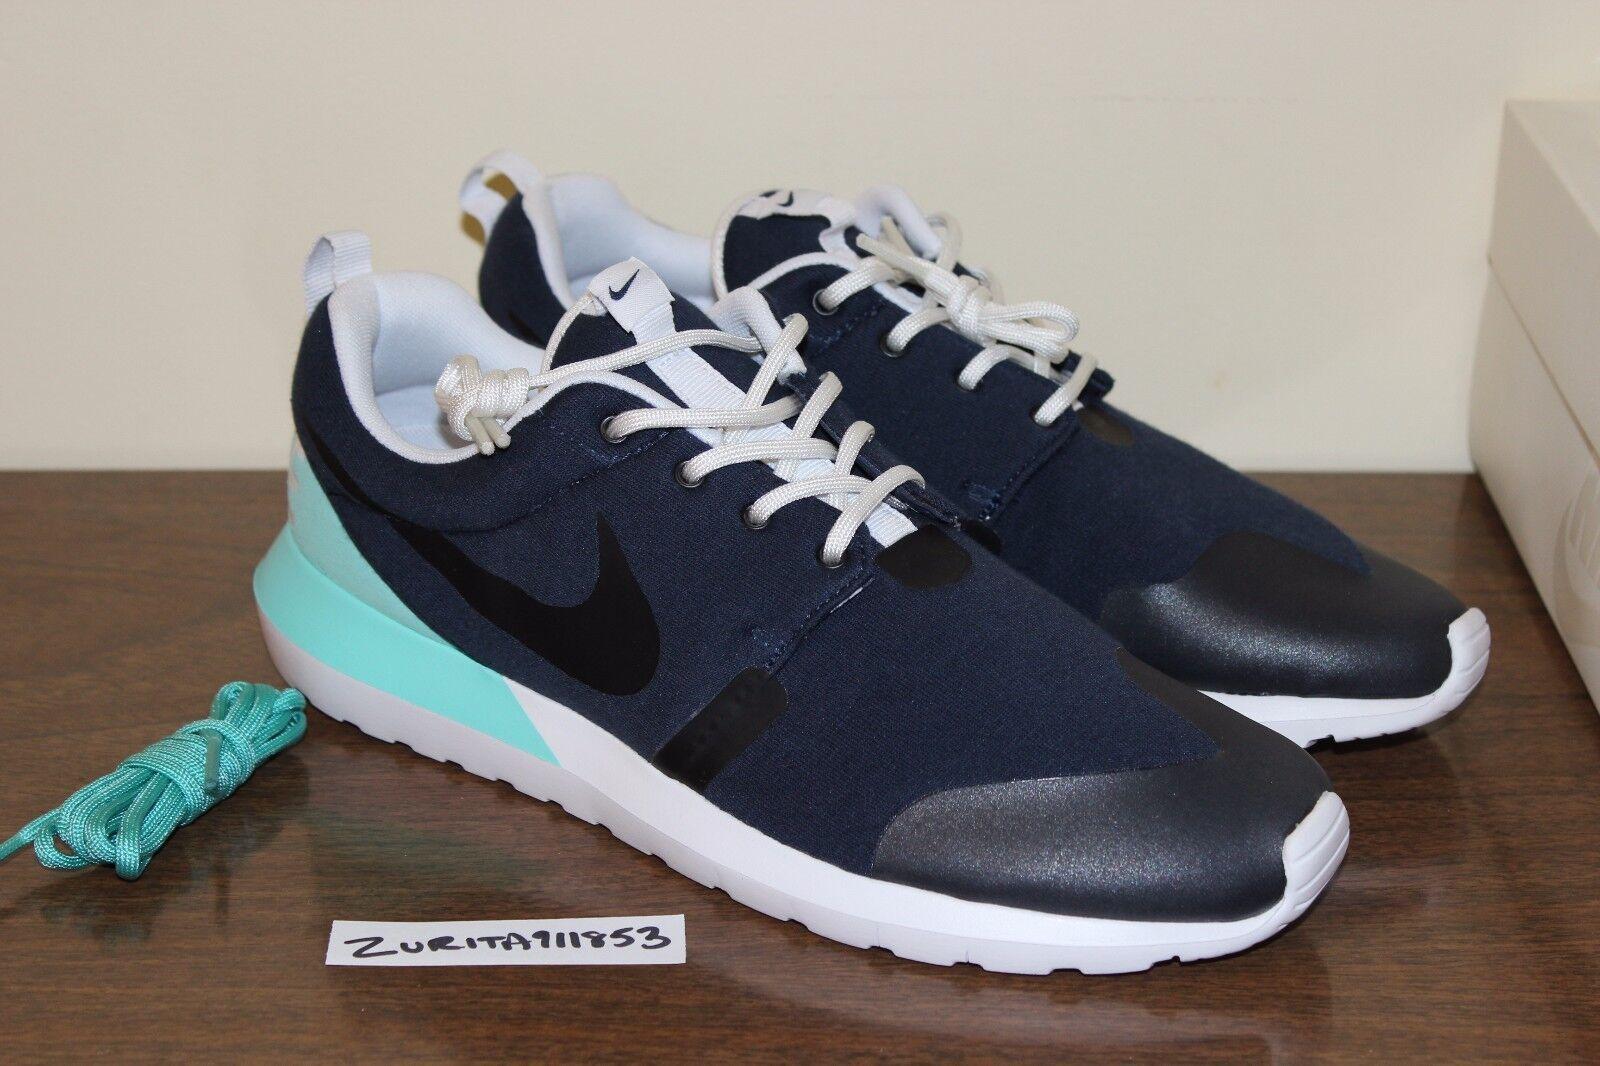 Nike Air Roshe Run NM W SP Obsidian Bleached Turquoise 652804-403 Tech Fleece